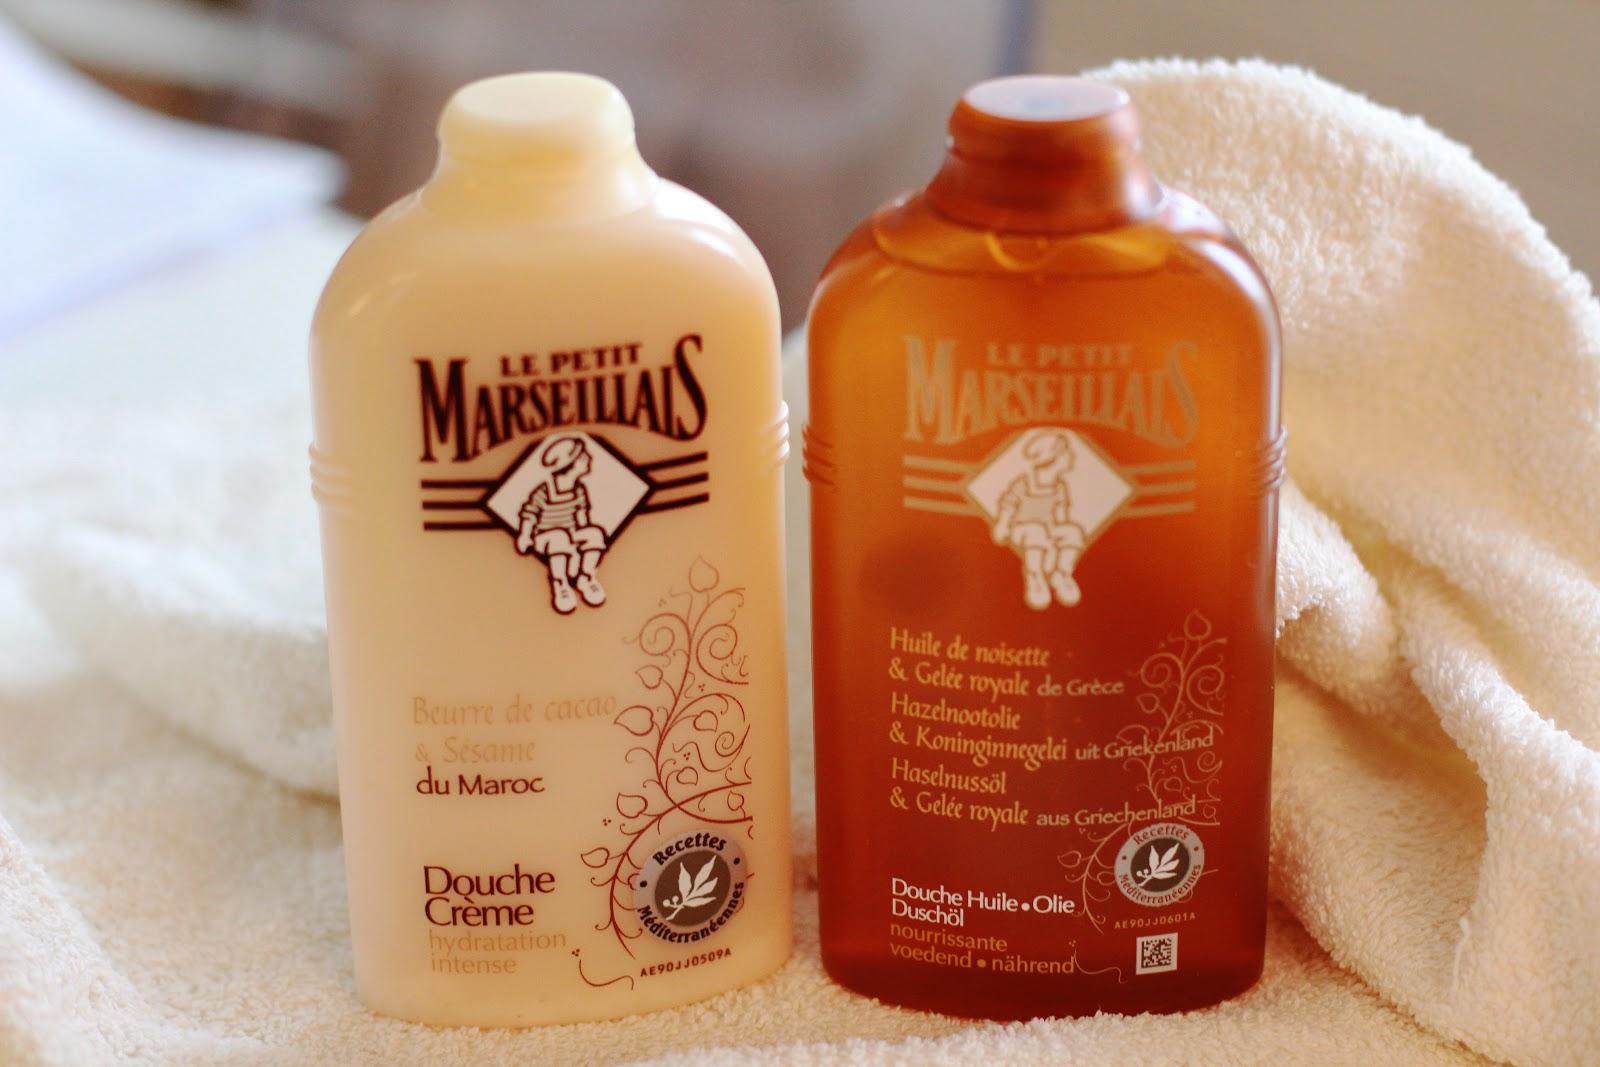 body progressive into q gloss fm gels the best warm fl gel shower smelling wash weather slider summer